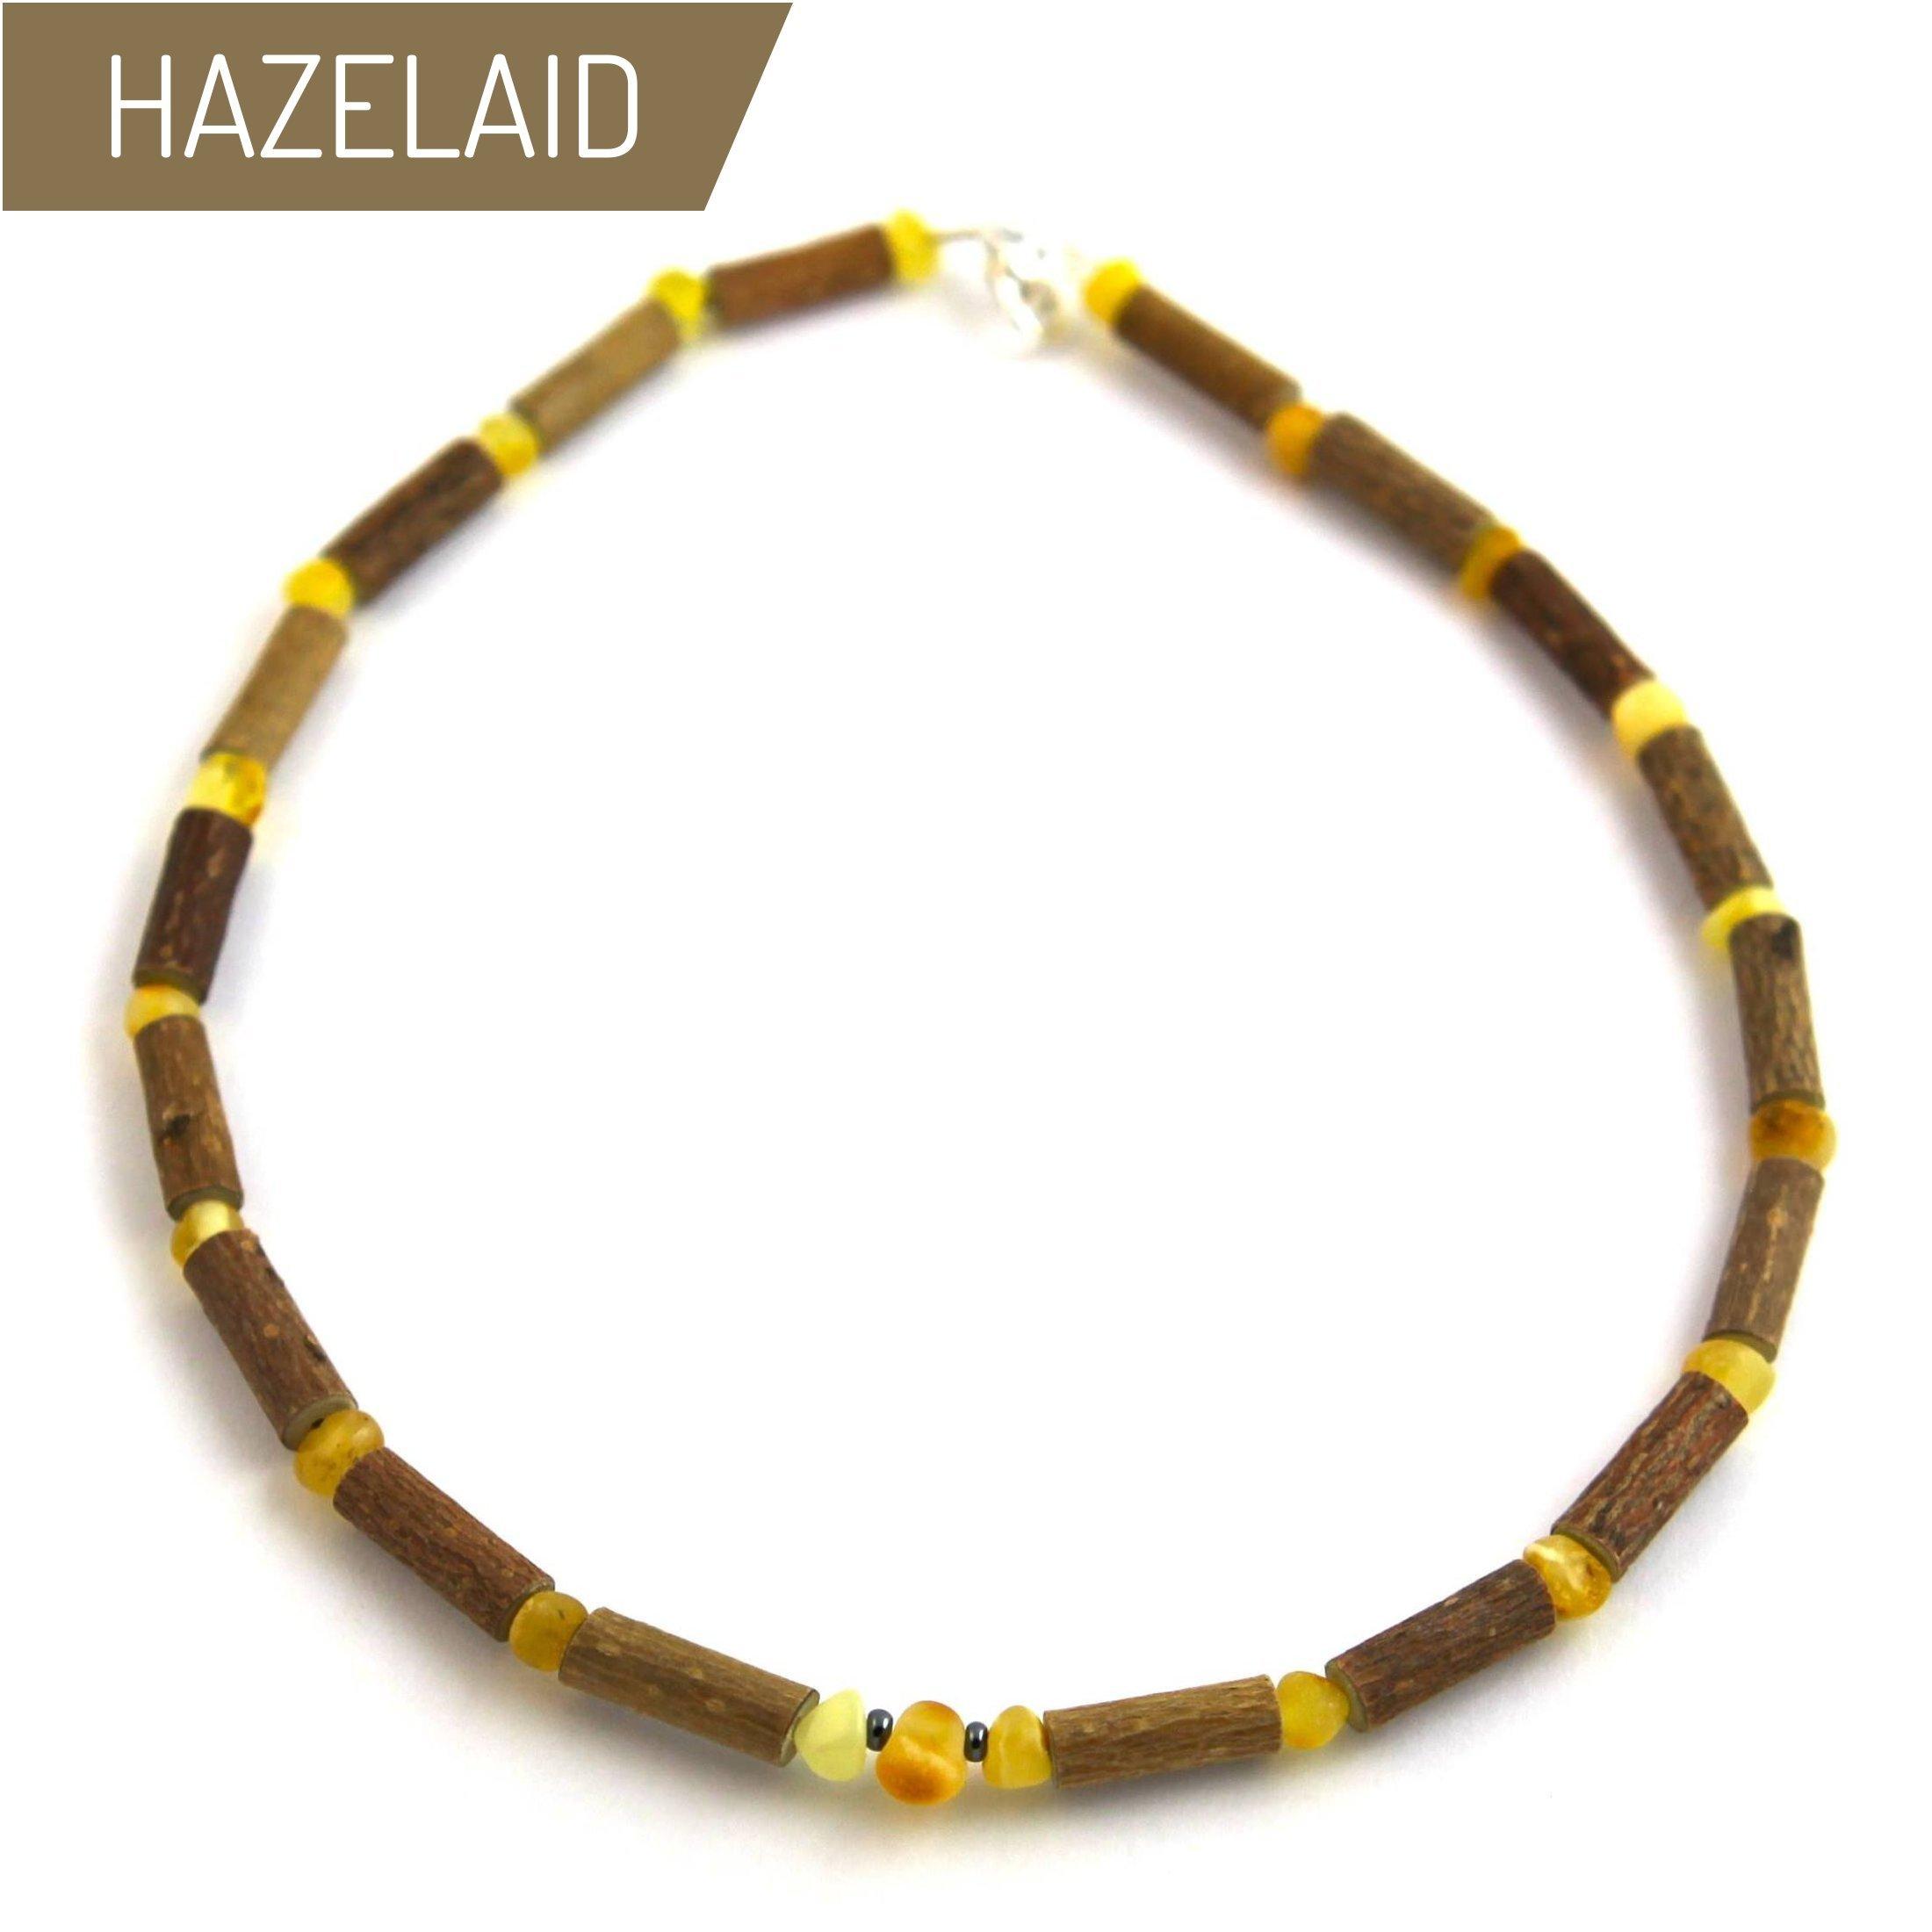 Hazelaid (TM) Child Hazelwood-Amber Necklace - 11'' Milk & Butter